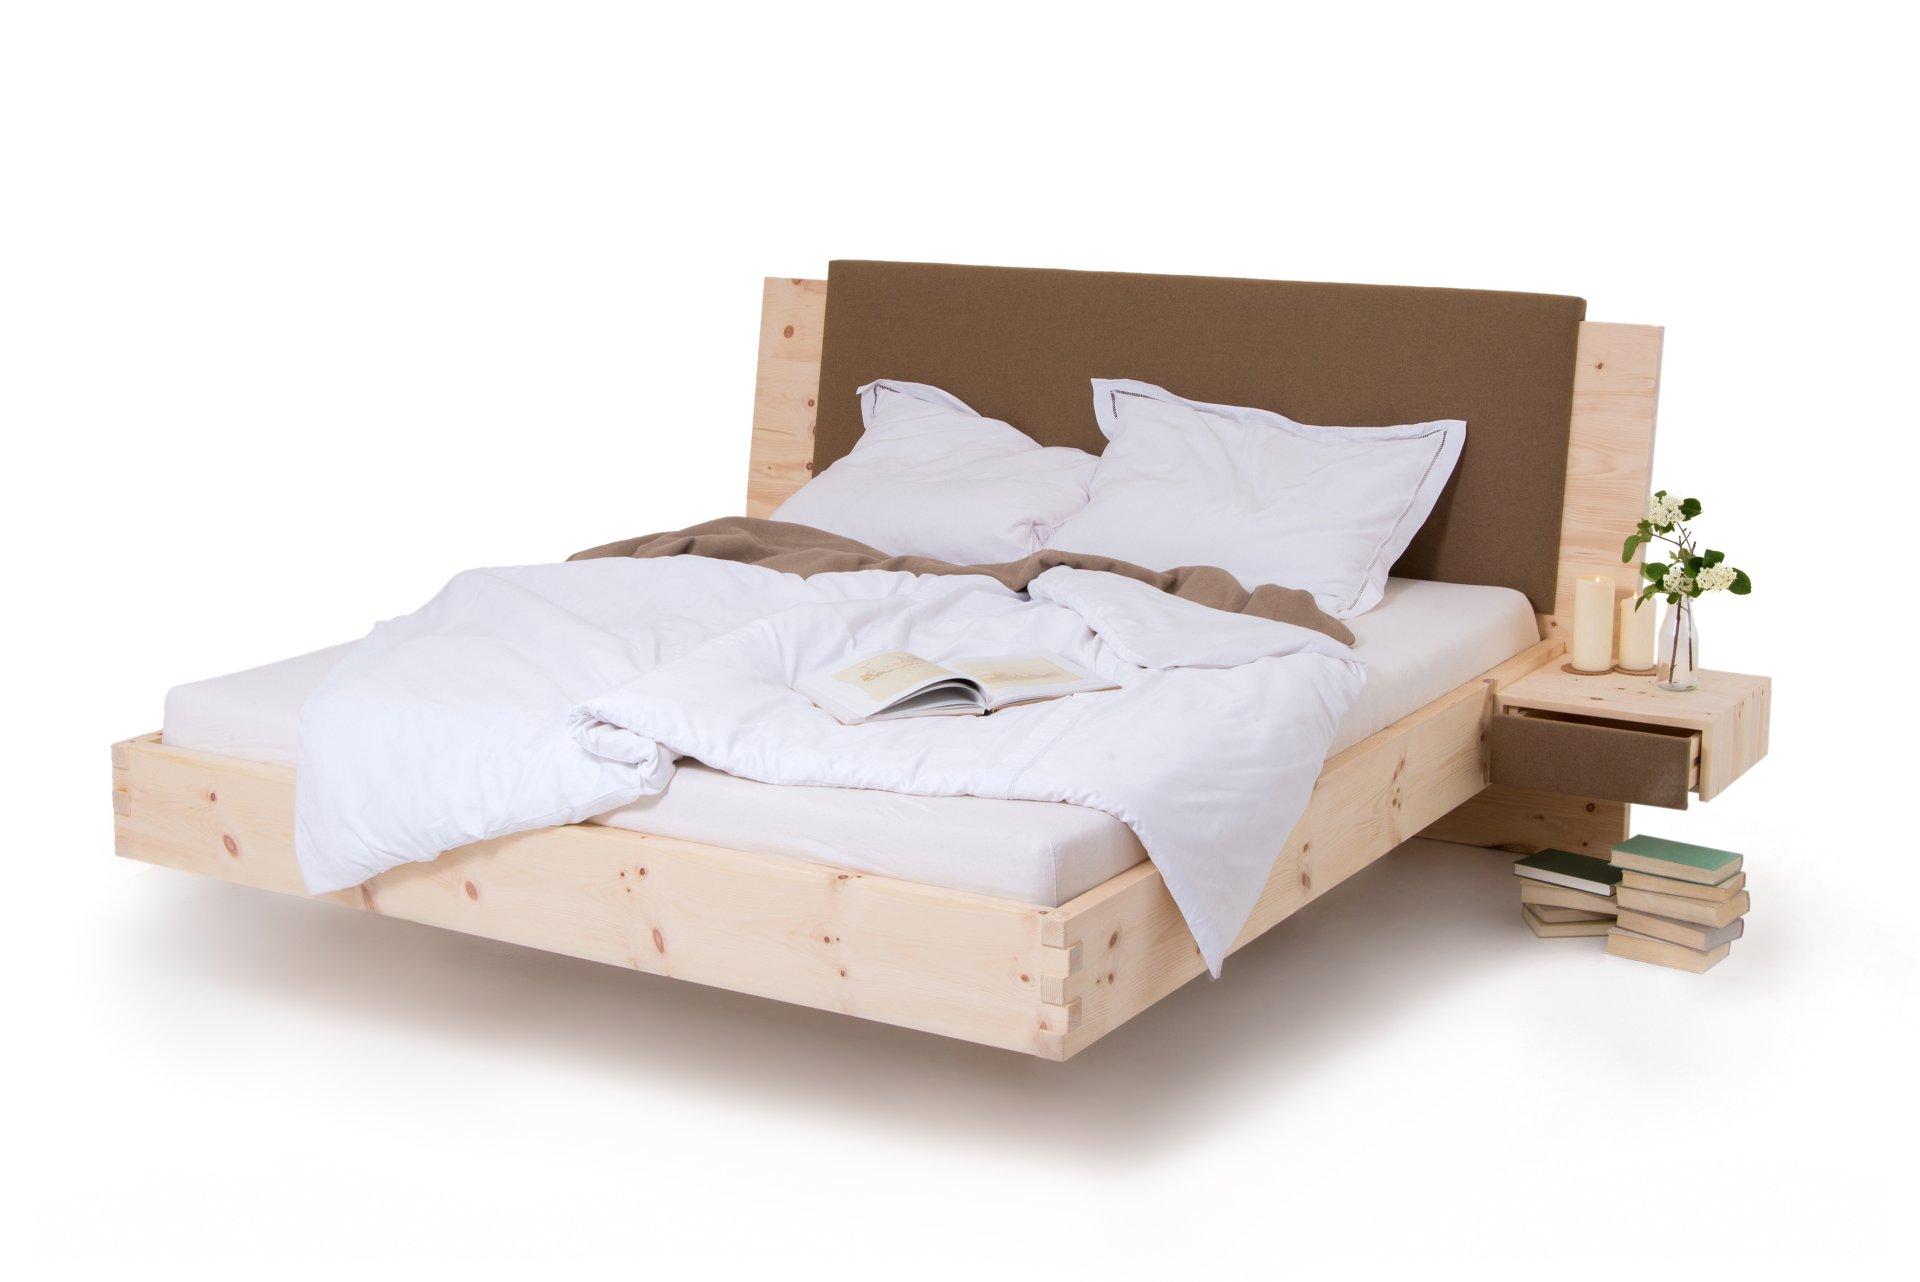 zirbenbett loden schwebend modern metallfrei schr cker zirbenbett zirbenbett schwebend. Black Bedroom Furniture Sets. Home Design Ideas